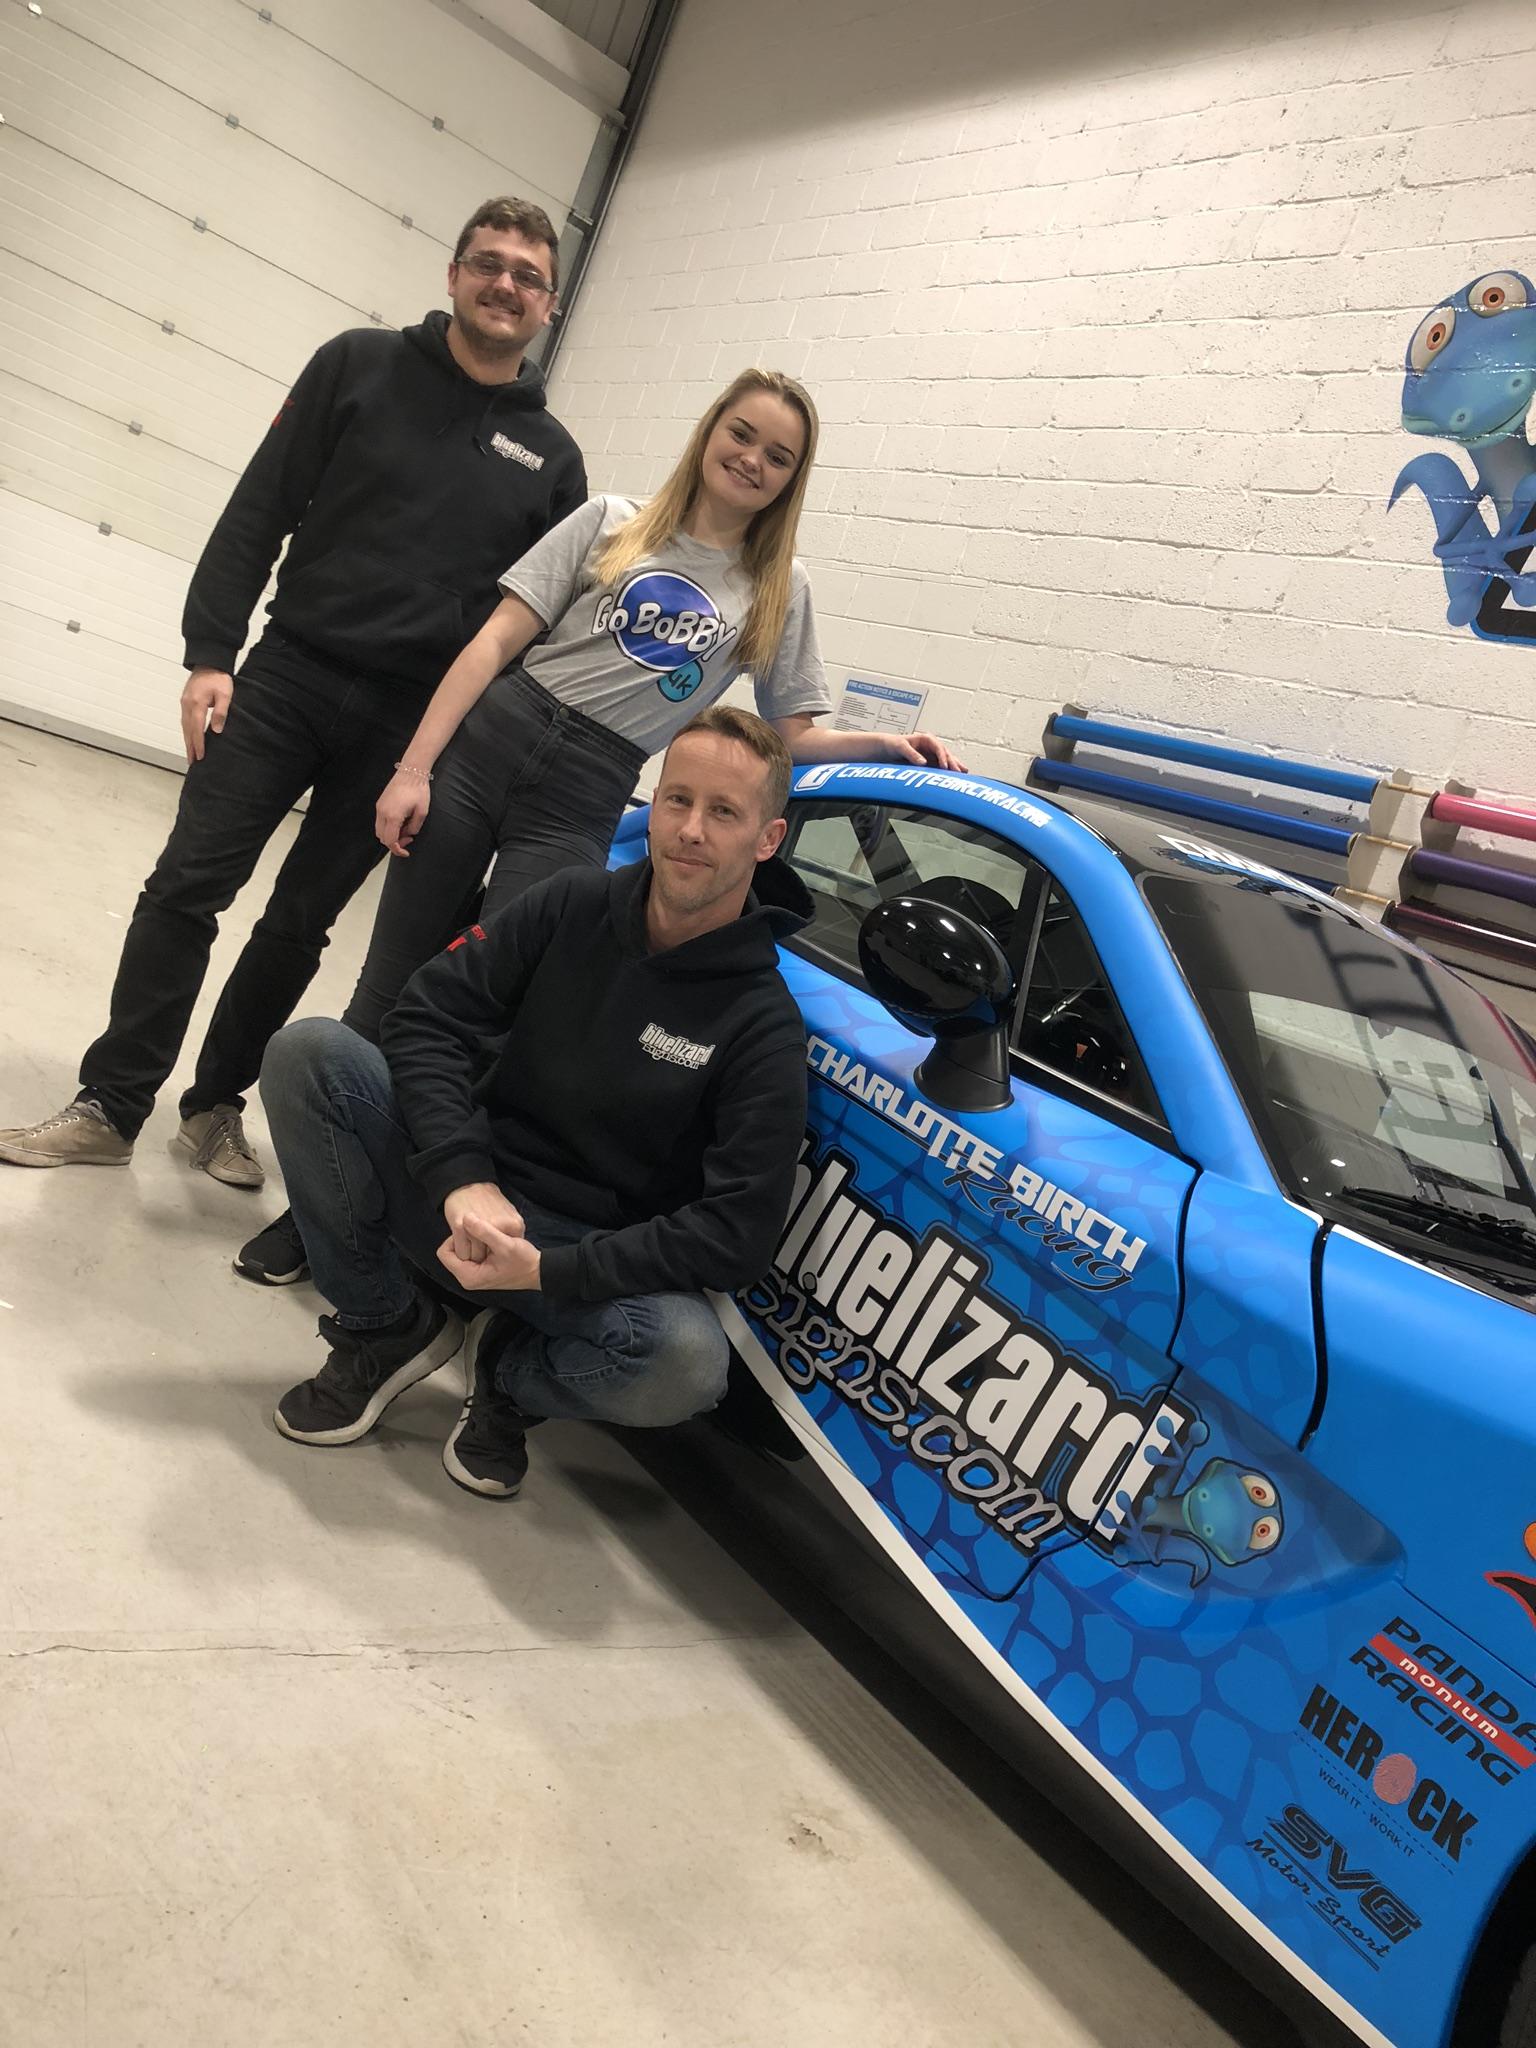 Charlotte Birch Racing